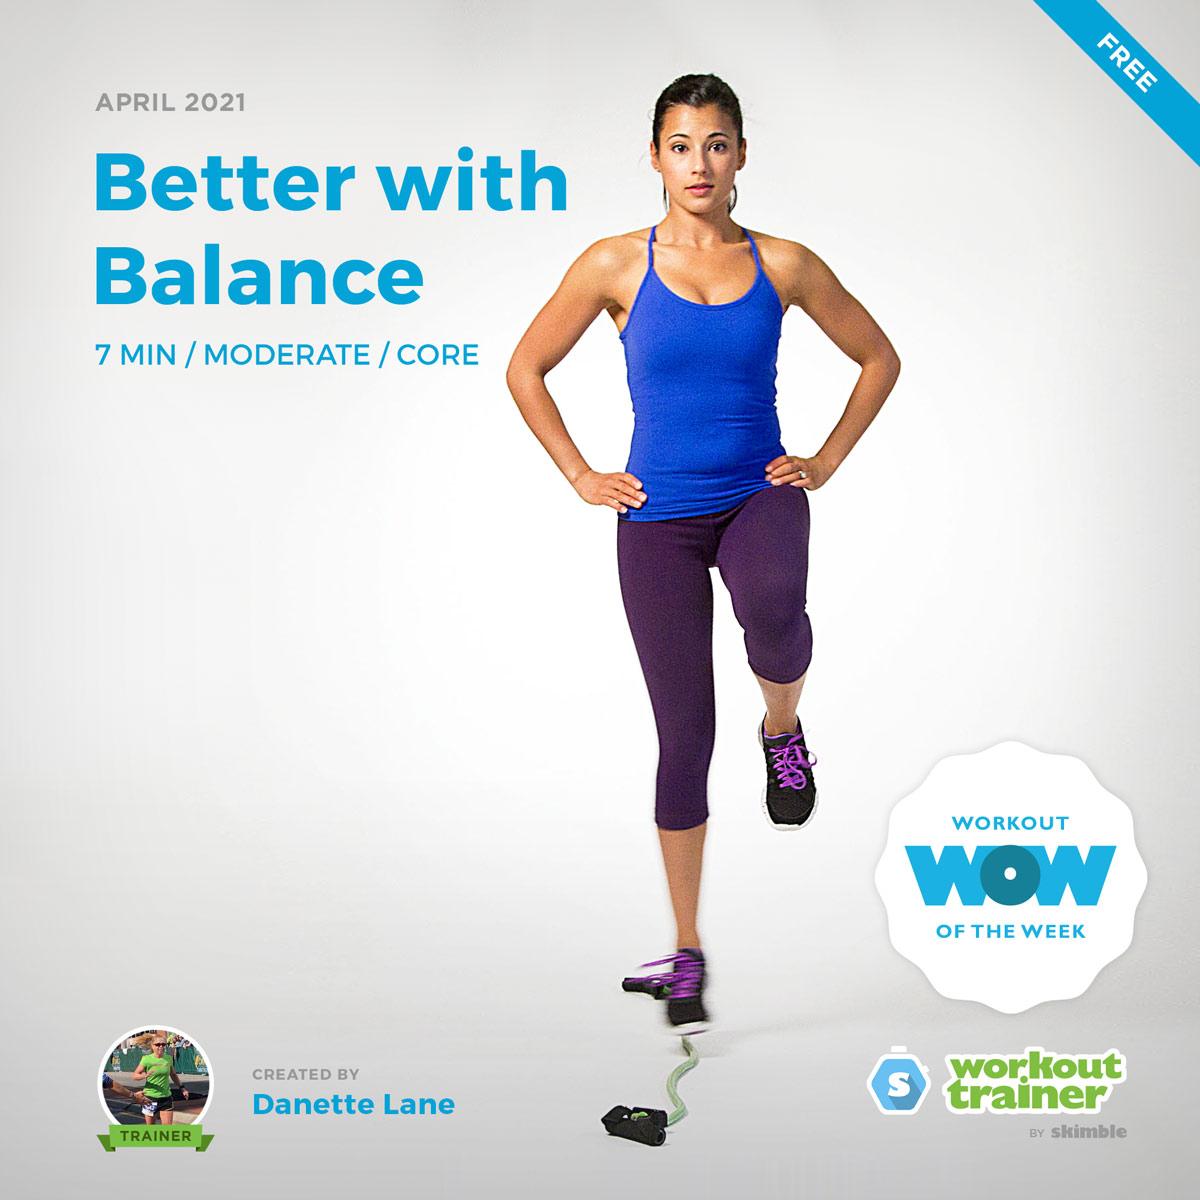 Female Fitness Instructor guiding us through some balance training exercises